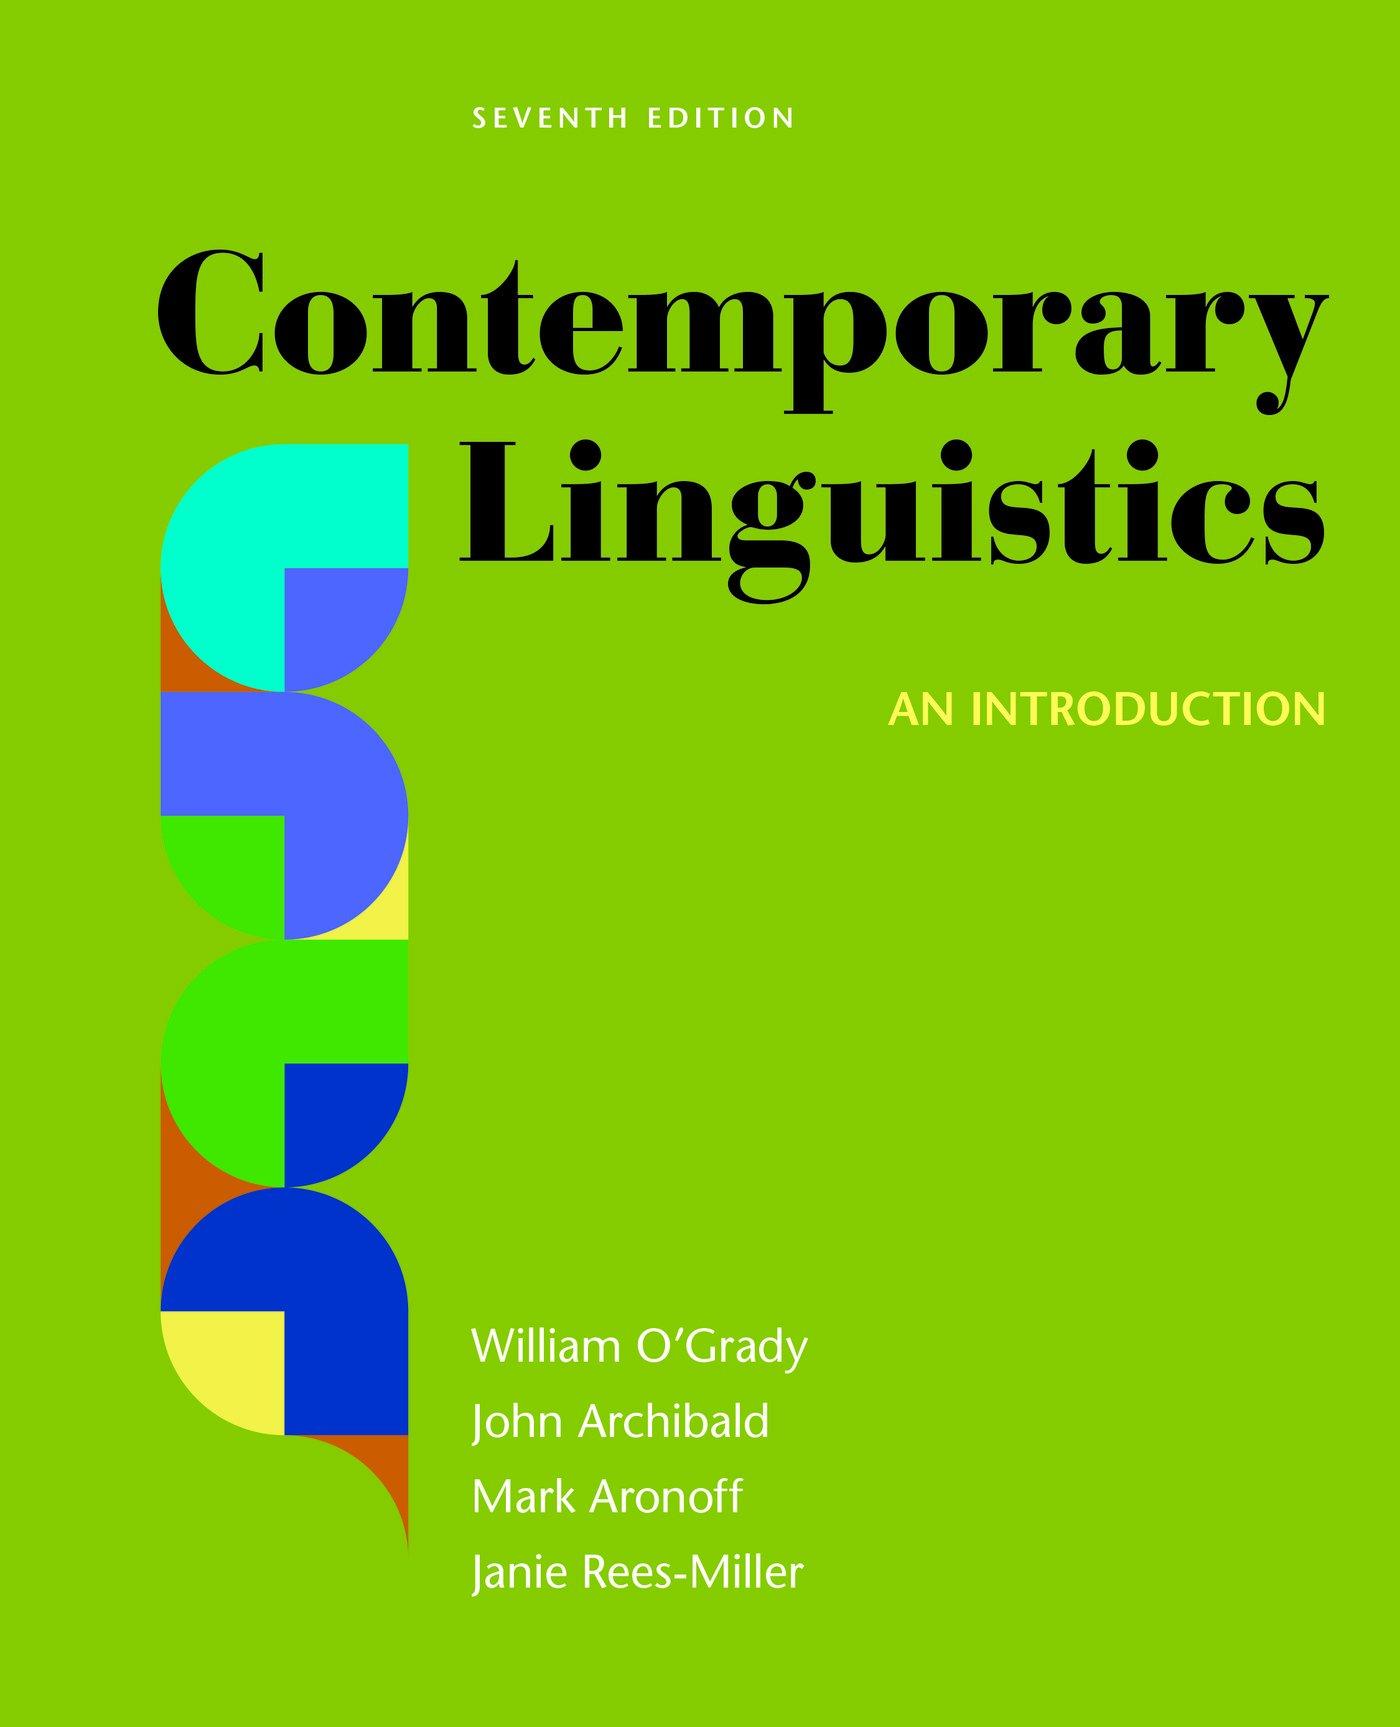 Contemporary Linguistics: An Introduction: Amazon.co.uk: William O'Grady,  John Archibald, Mark Aronoff, Janie Rees-Miller: 9781319039776: Books